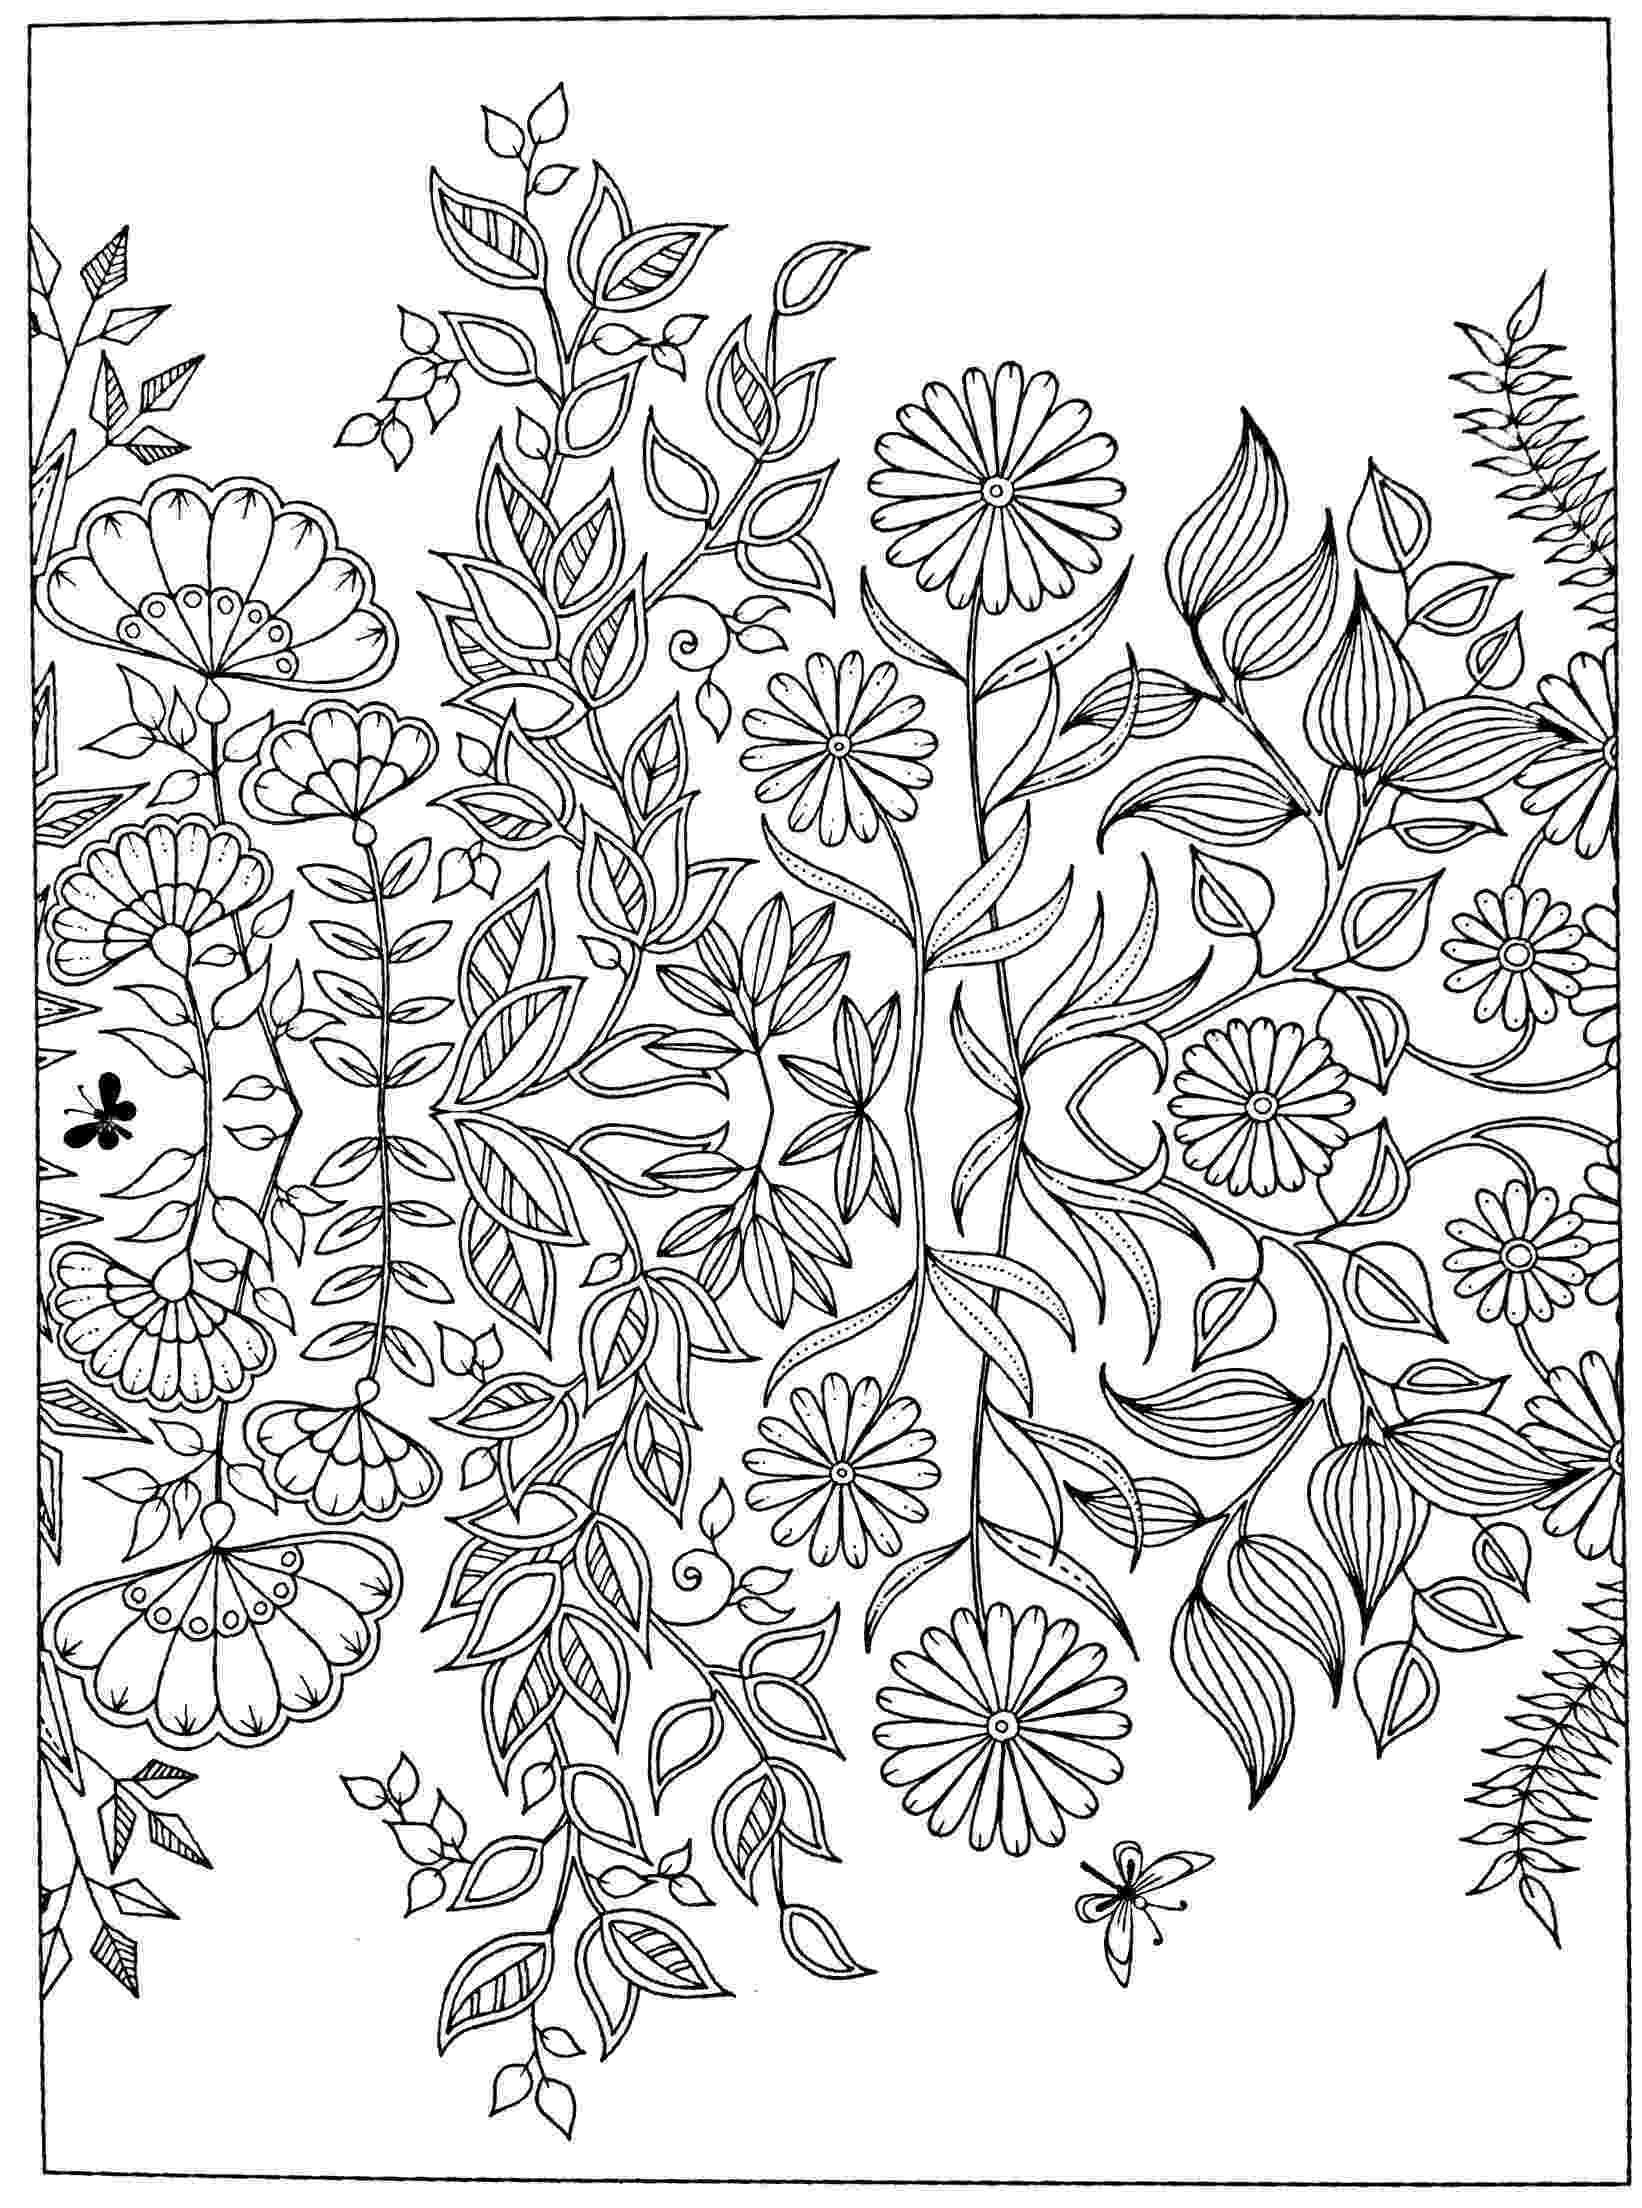 printable coloring book secret garden last days in the secret garden by namtia coloring page book coloring garden secret printable